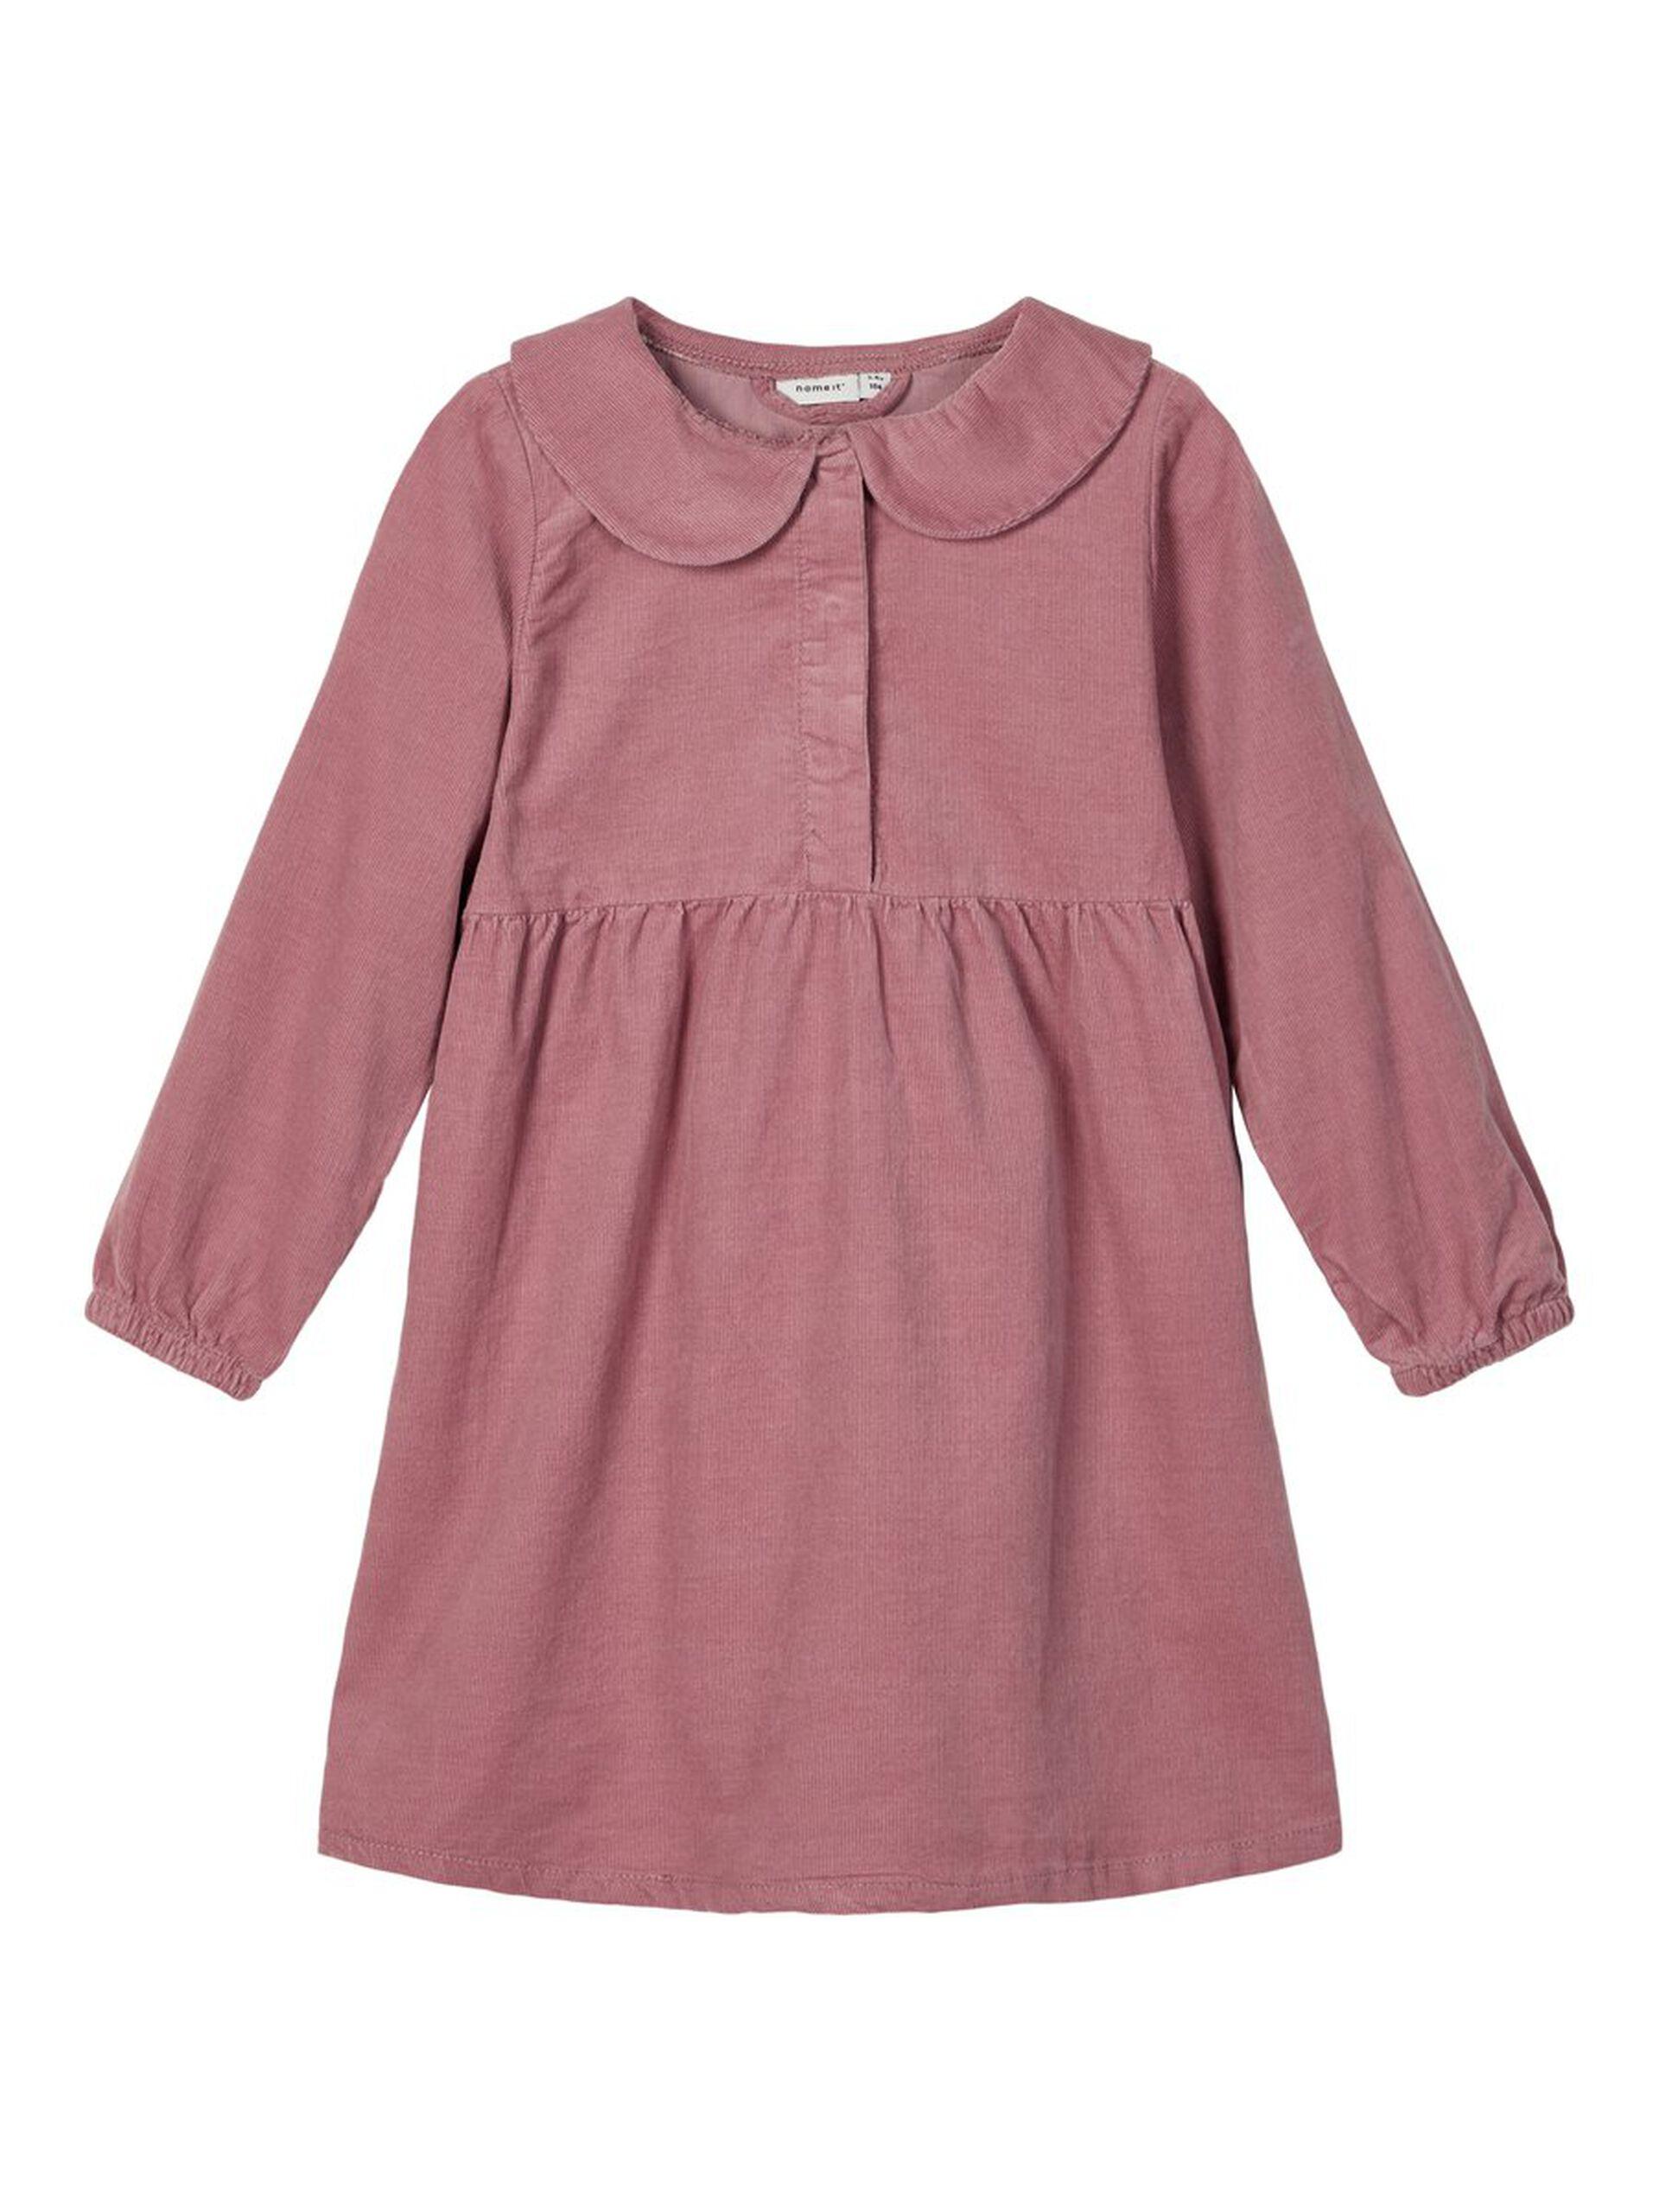 Name It kjole kordfløyel